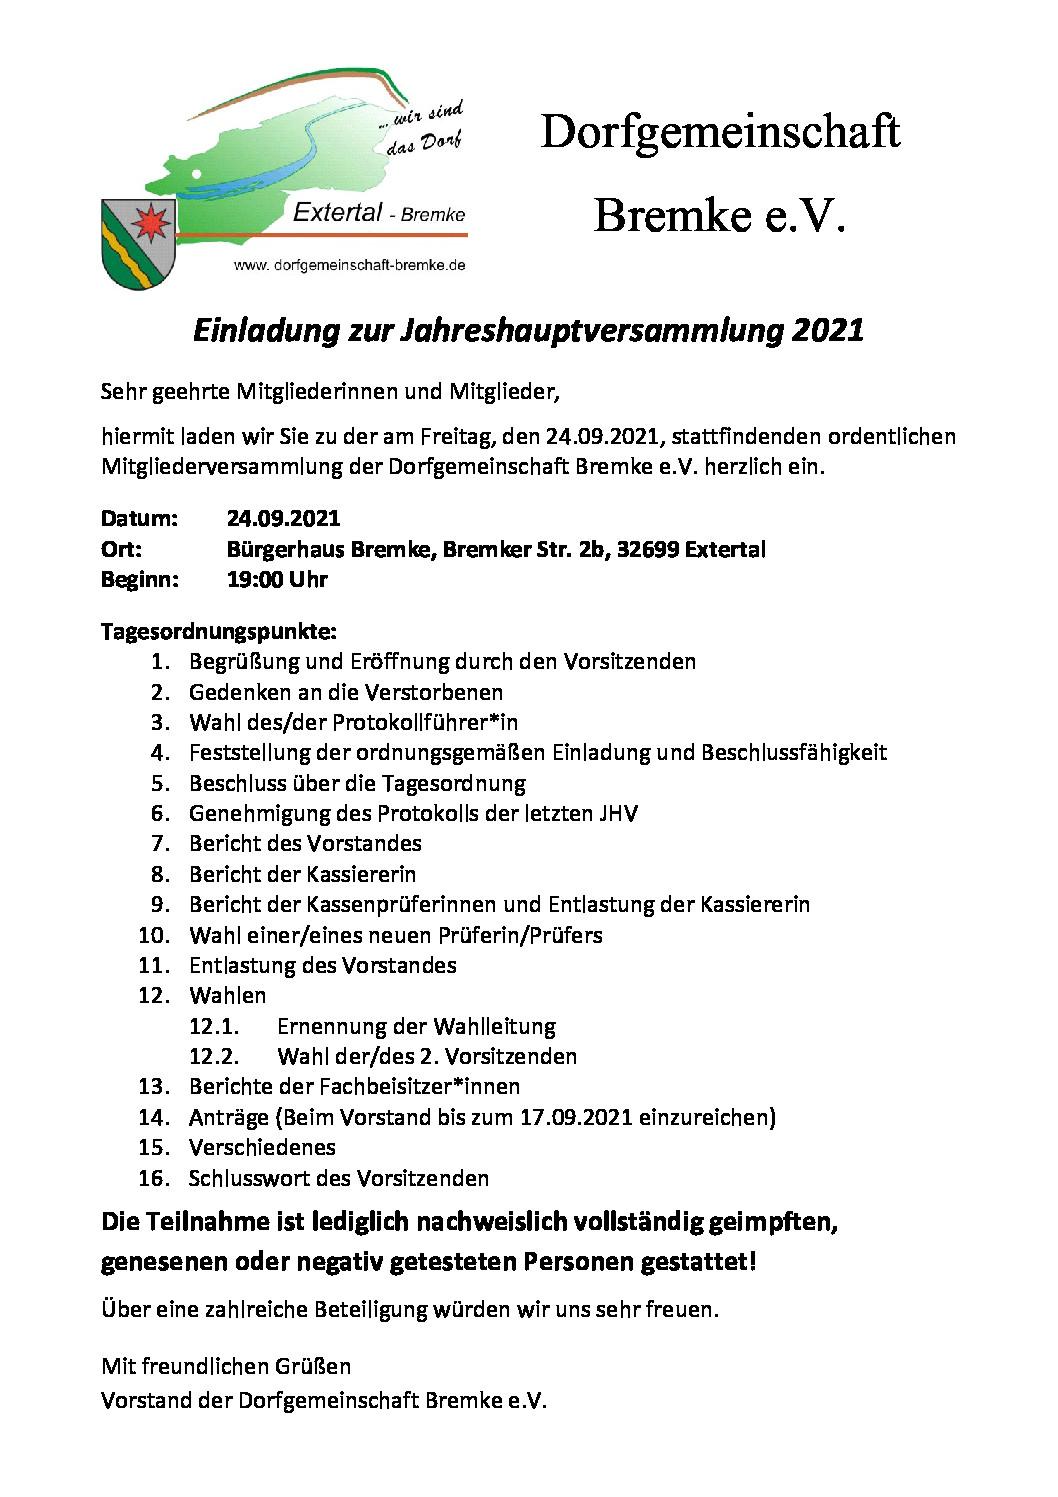 https://dorfgemeinschaft-bremke.de/wordpress/wp-content/uploads/2021/09/2021-09_Einladung-JHV-2020-pdf.jpg